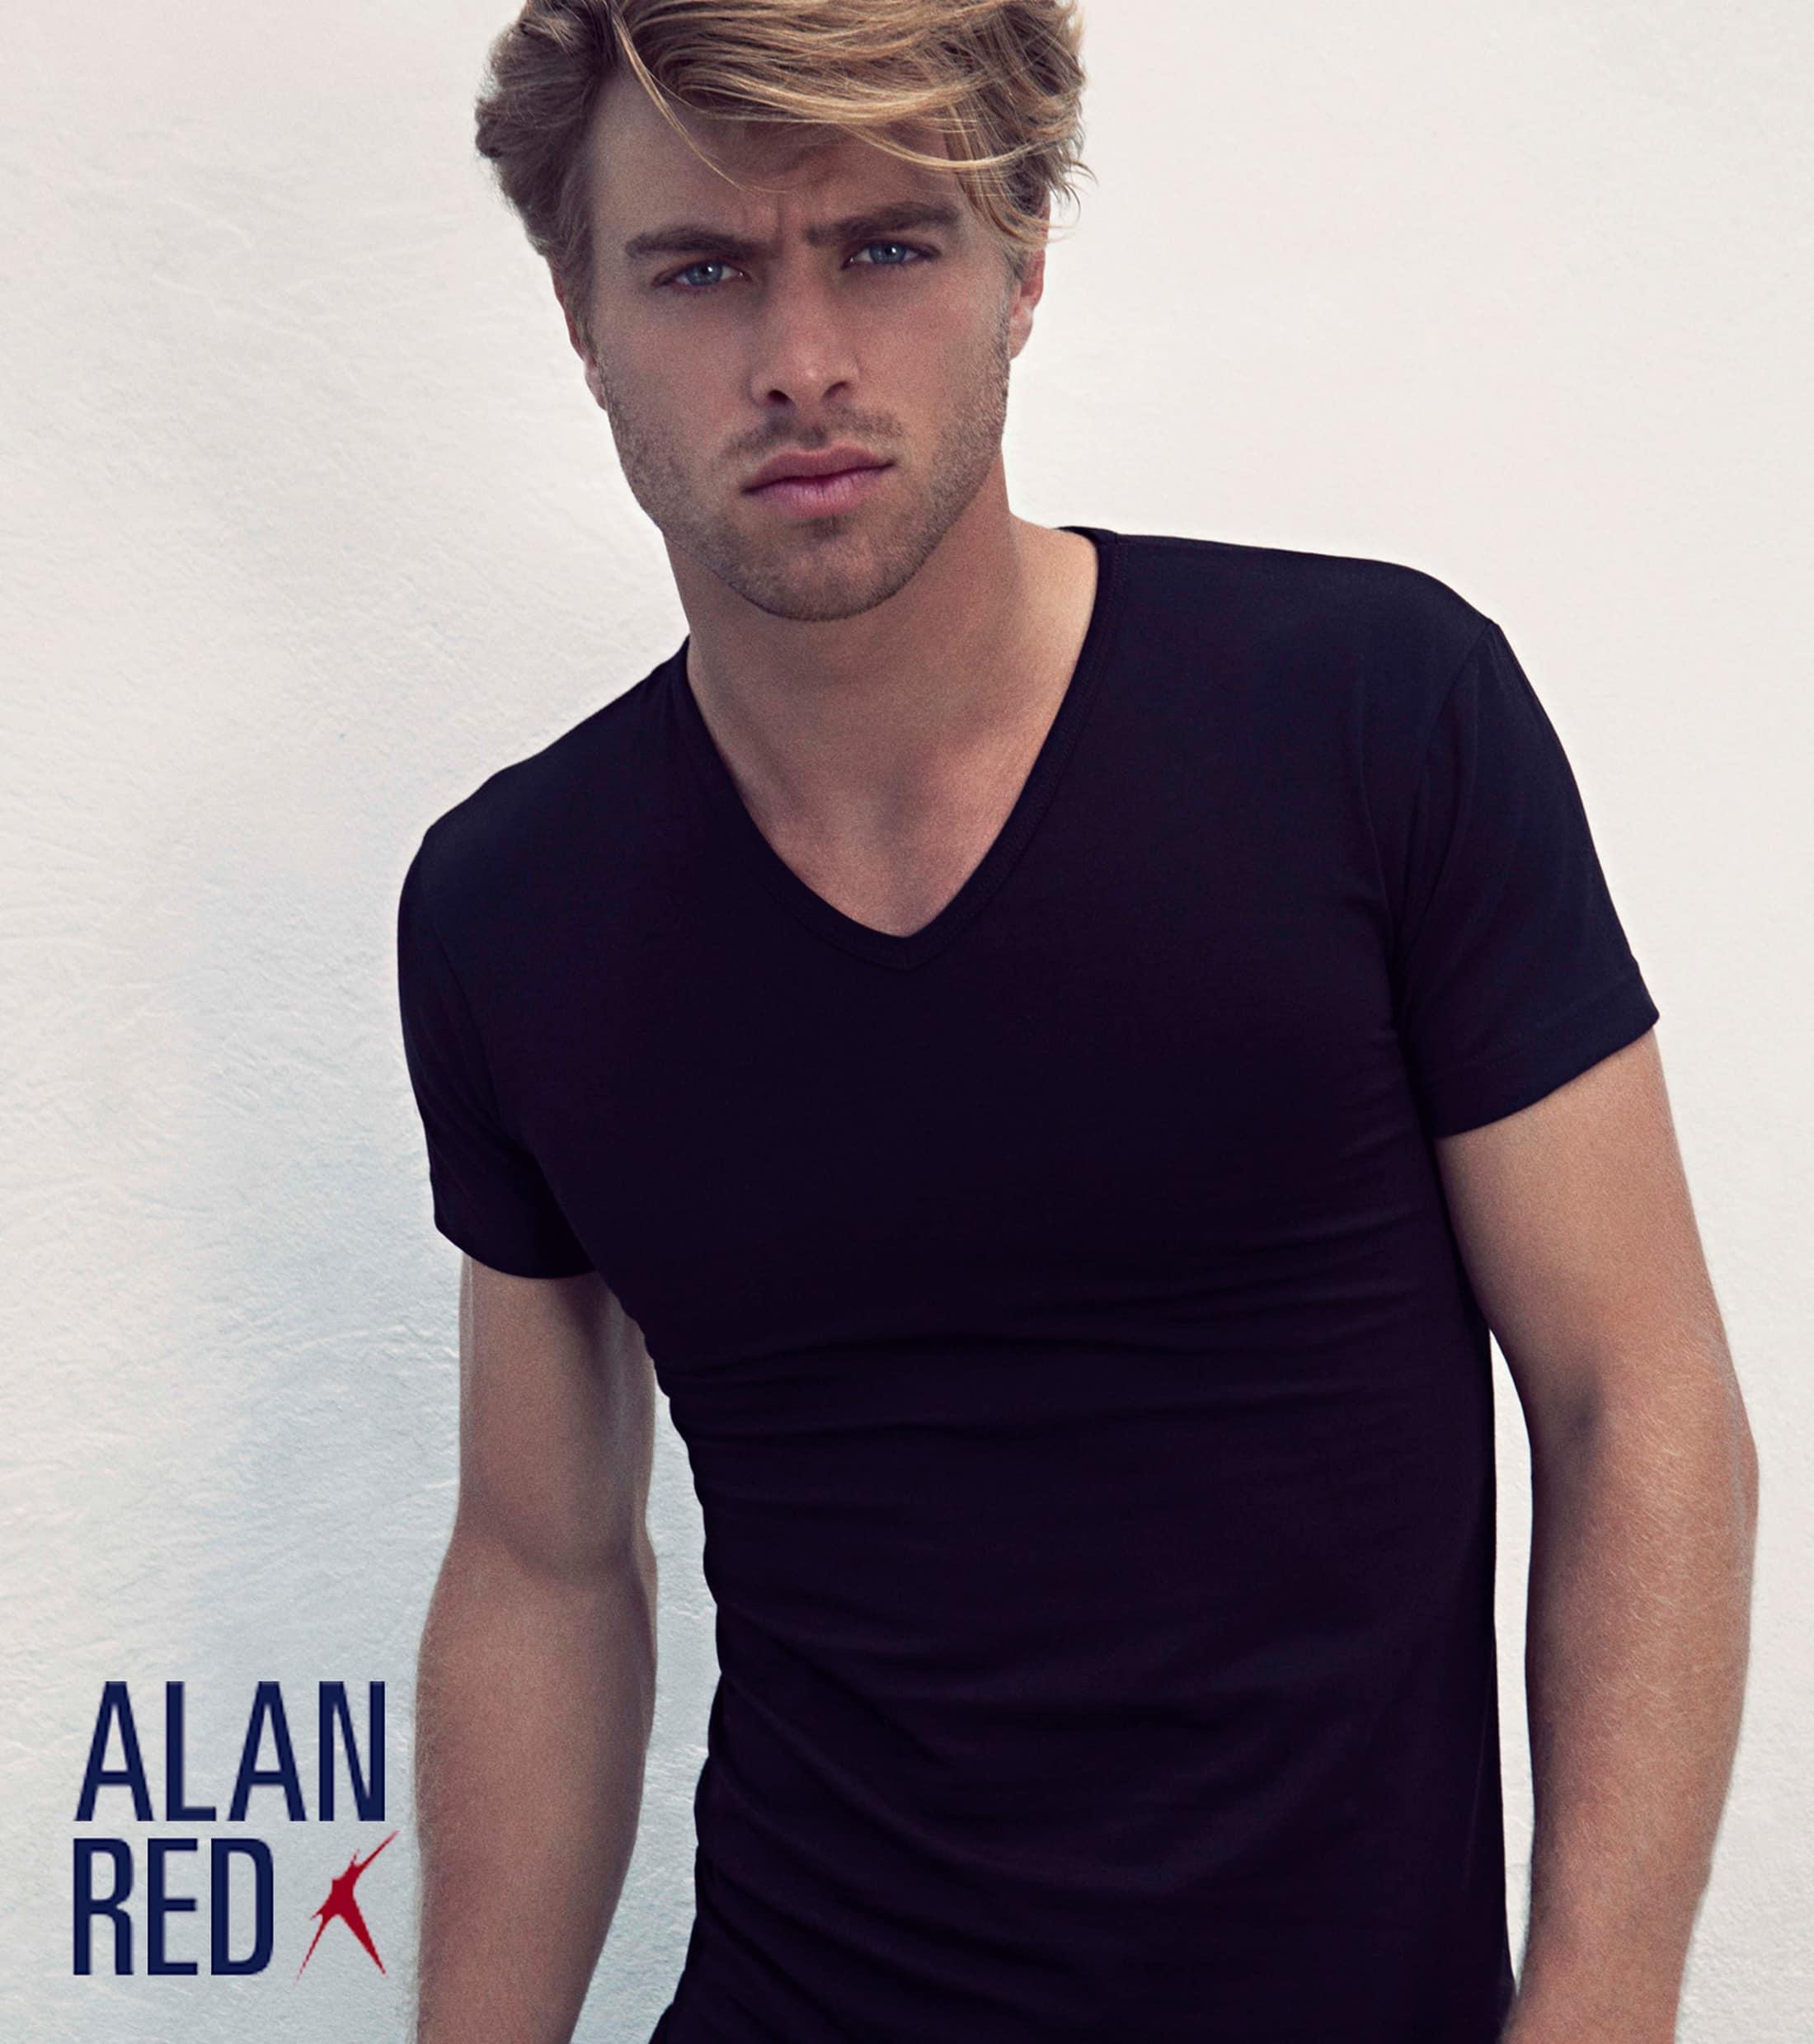 Alan Red Oklahoma T-shirt Stretch Zwart (1pack) foto 3